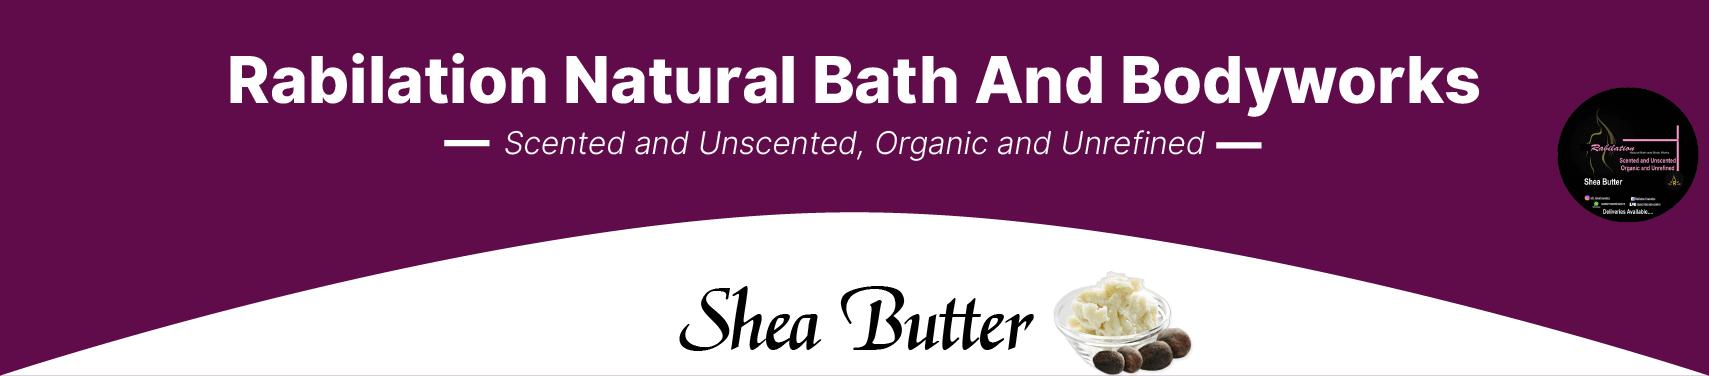 Rabilation Natural Bath and Bodyworks